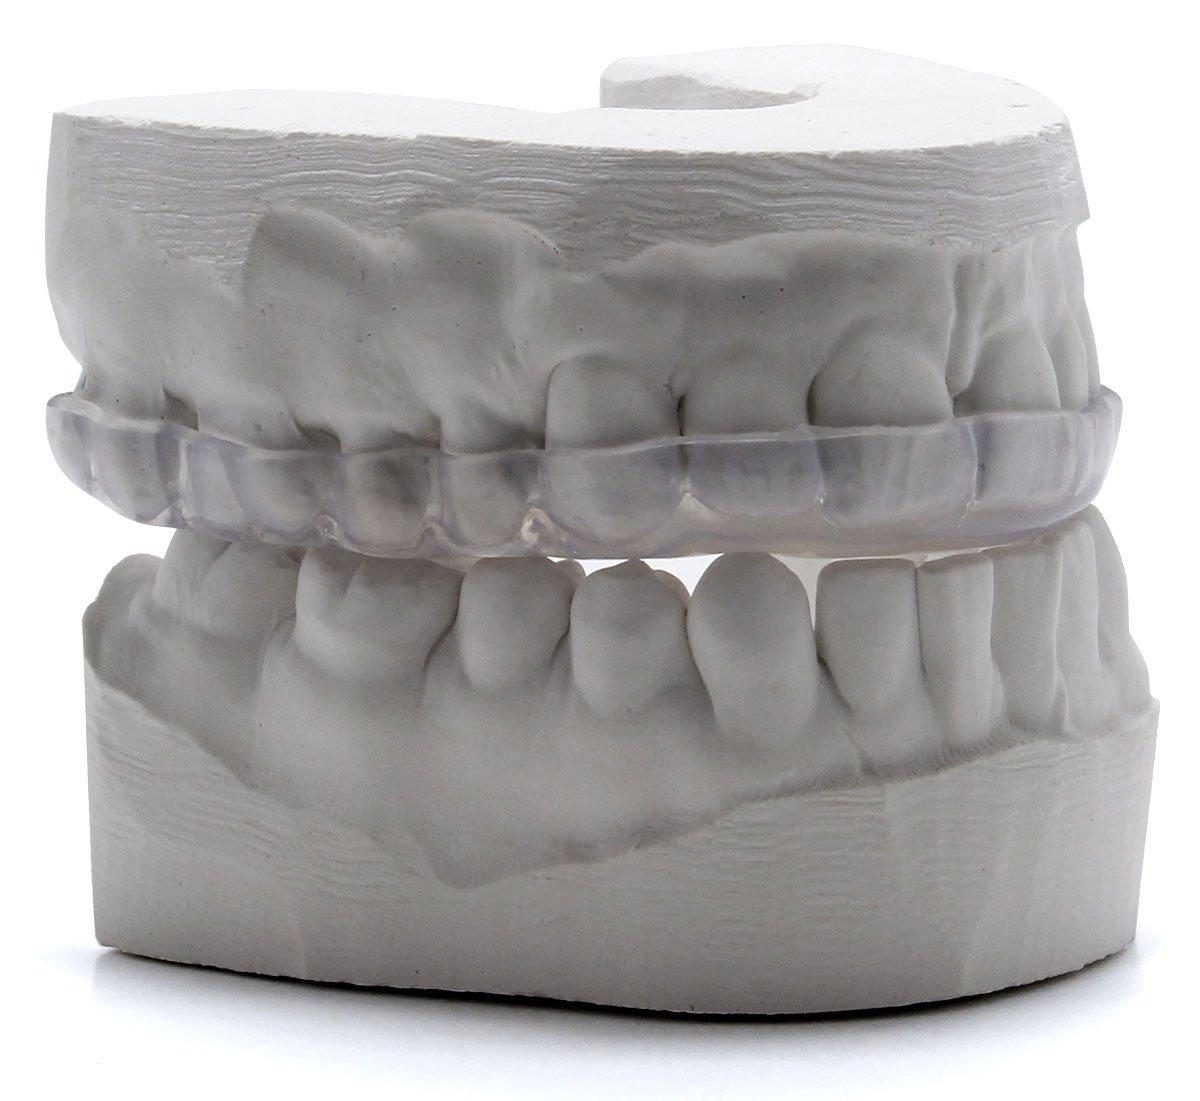 Custom Dental Night Guard for Teeth Grinding - Pro Teeth Guard. 365 Day 100% Money Back Guarantee. Size: Adult-Male. by Pro Teeth Guard (Image #2)